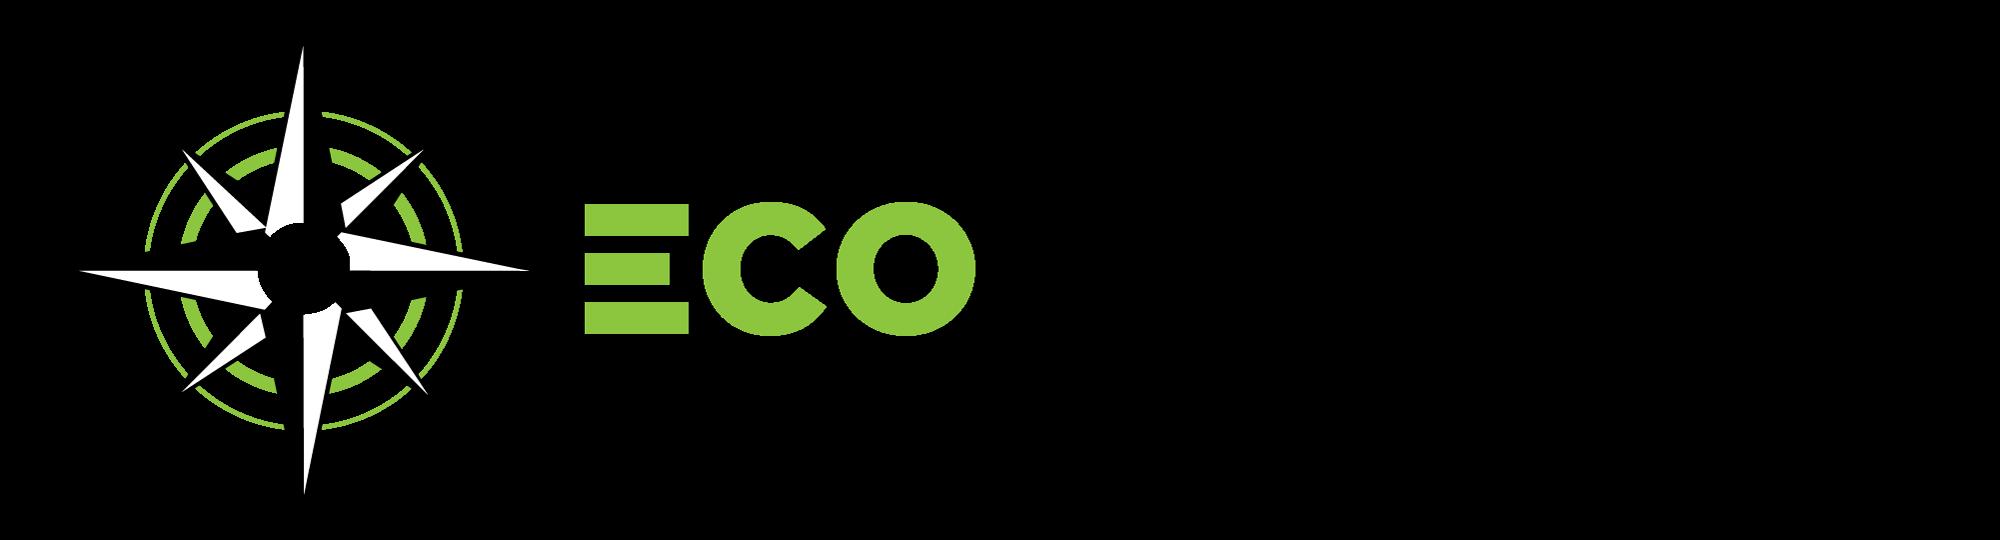 EcoCompass-Logo-Horizontal (002).png